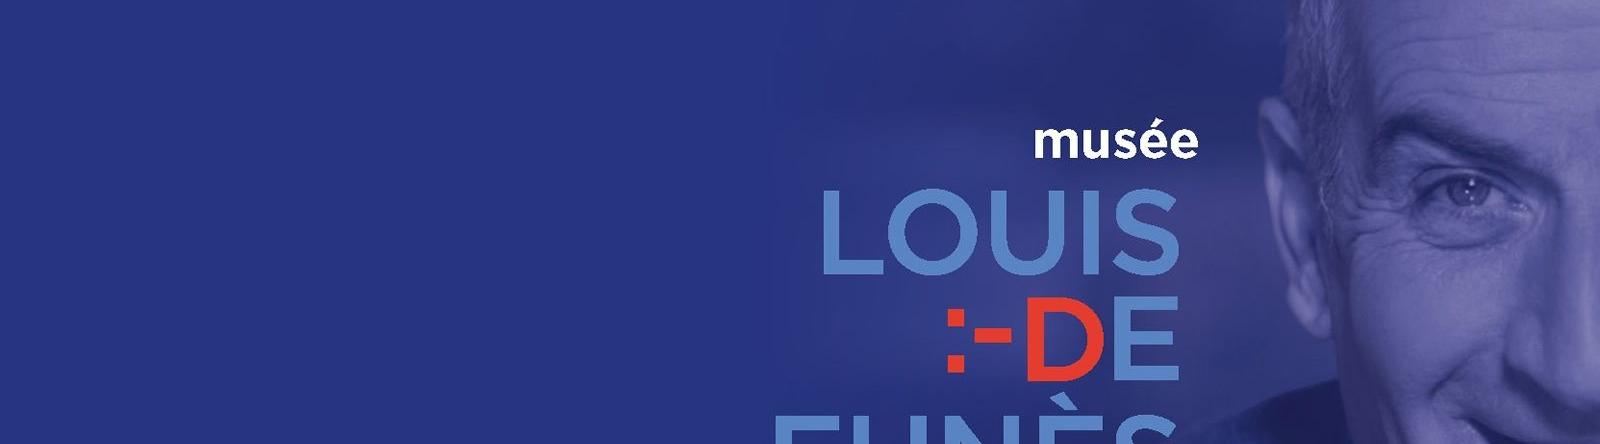 presse Le figaro Louis de Funes